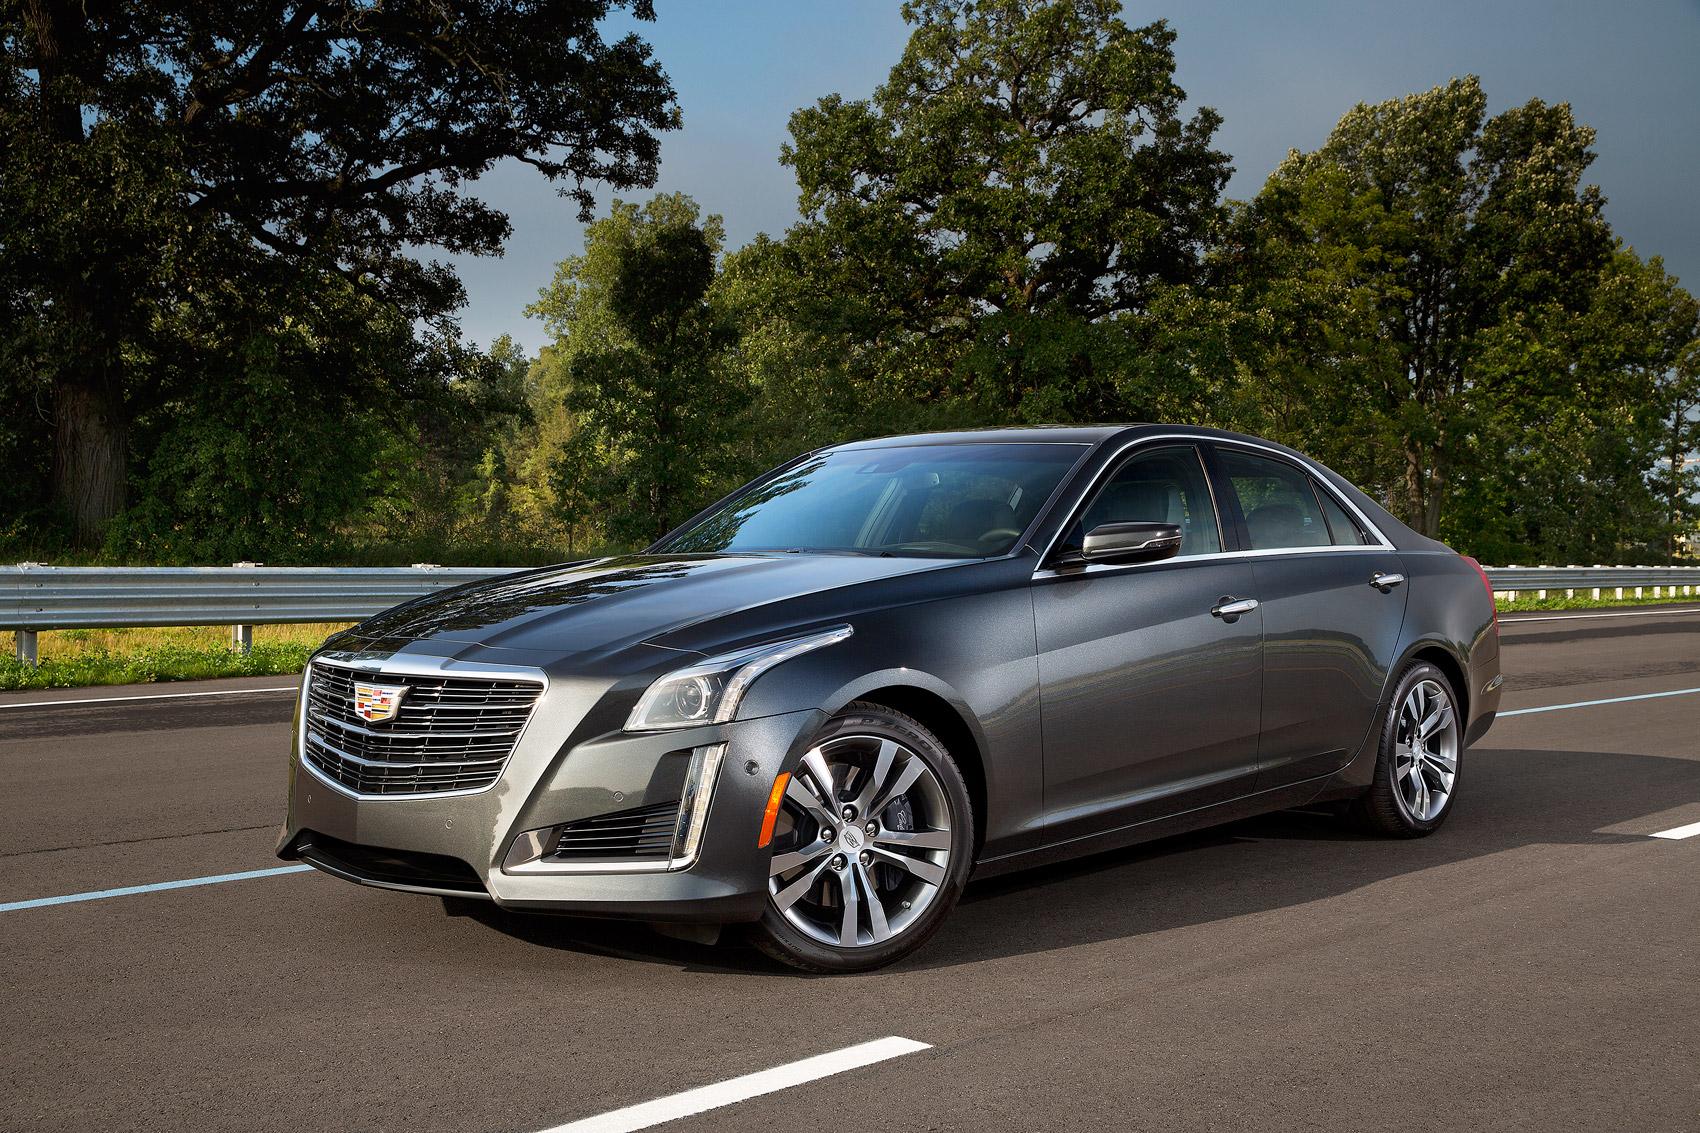 Latest U.S Market Performance For Cadillac, Jaguar Land Rover & Porsche 2